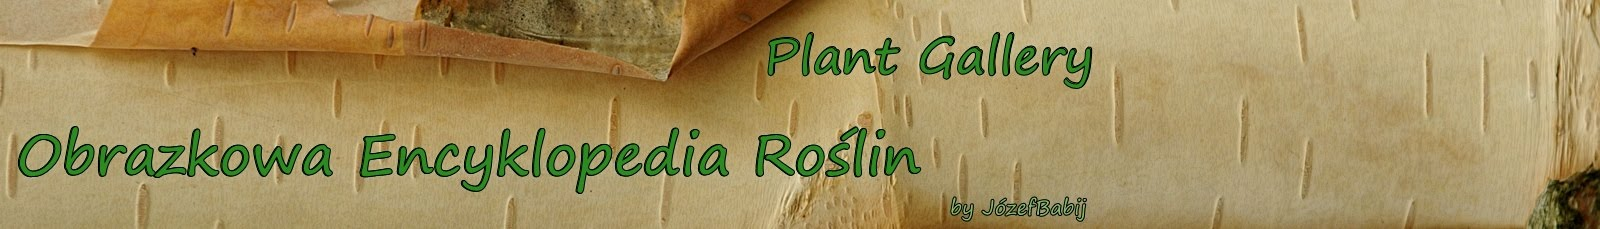 Plant Gallery - Encyklopedia Roślin